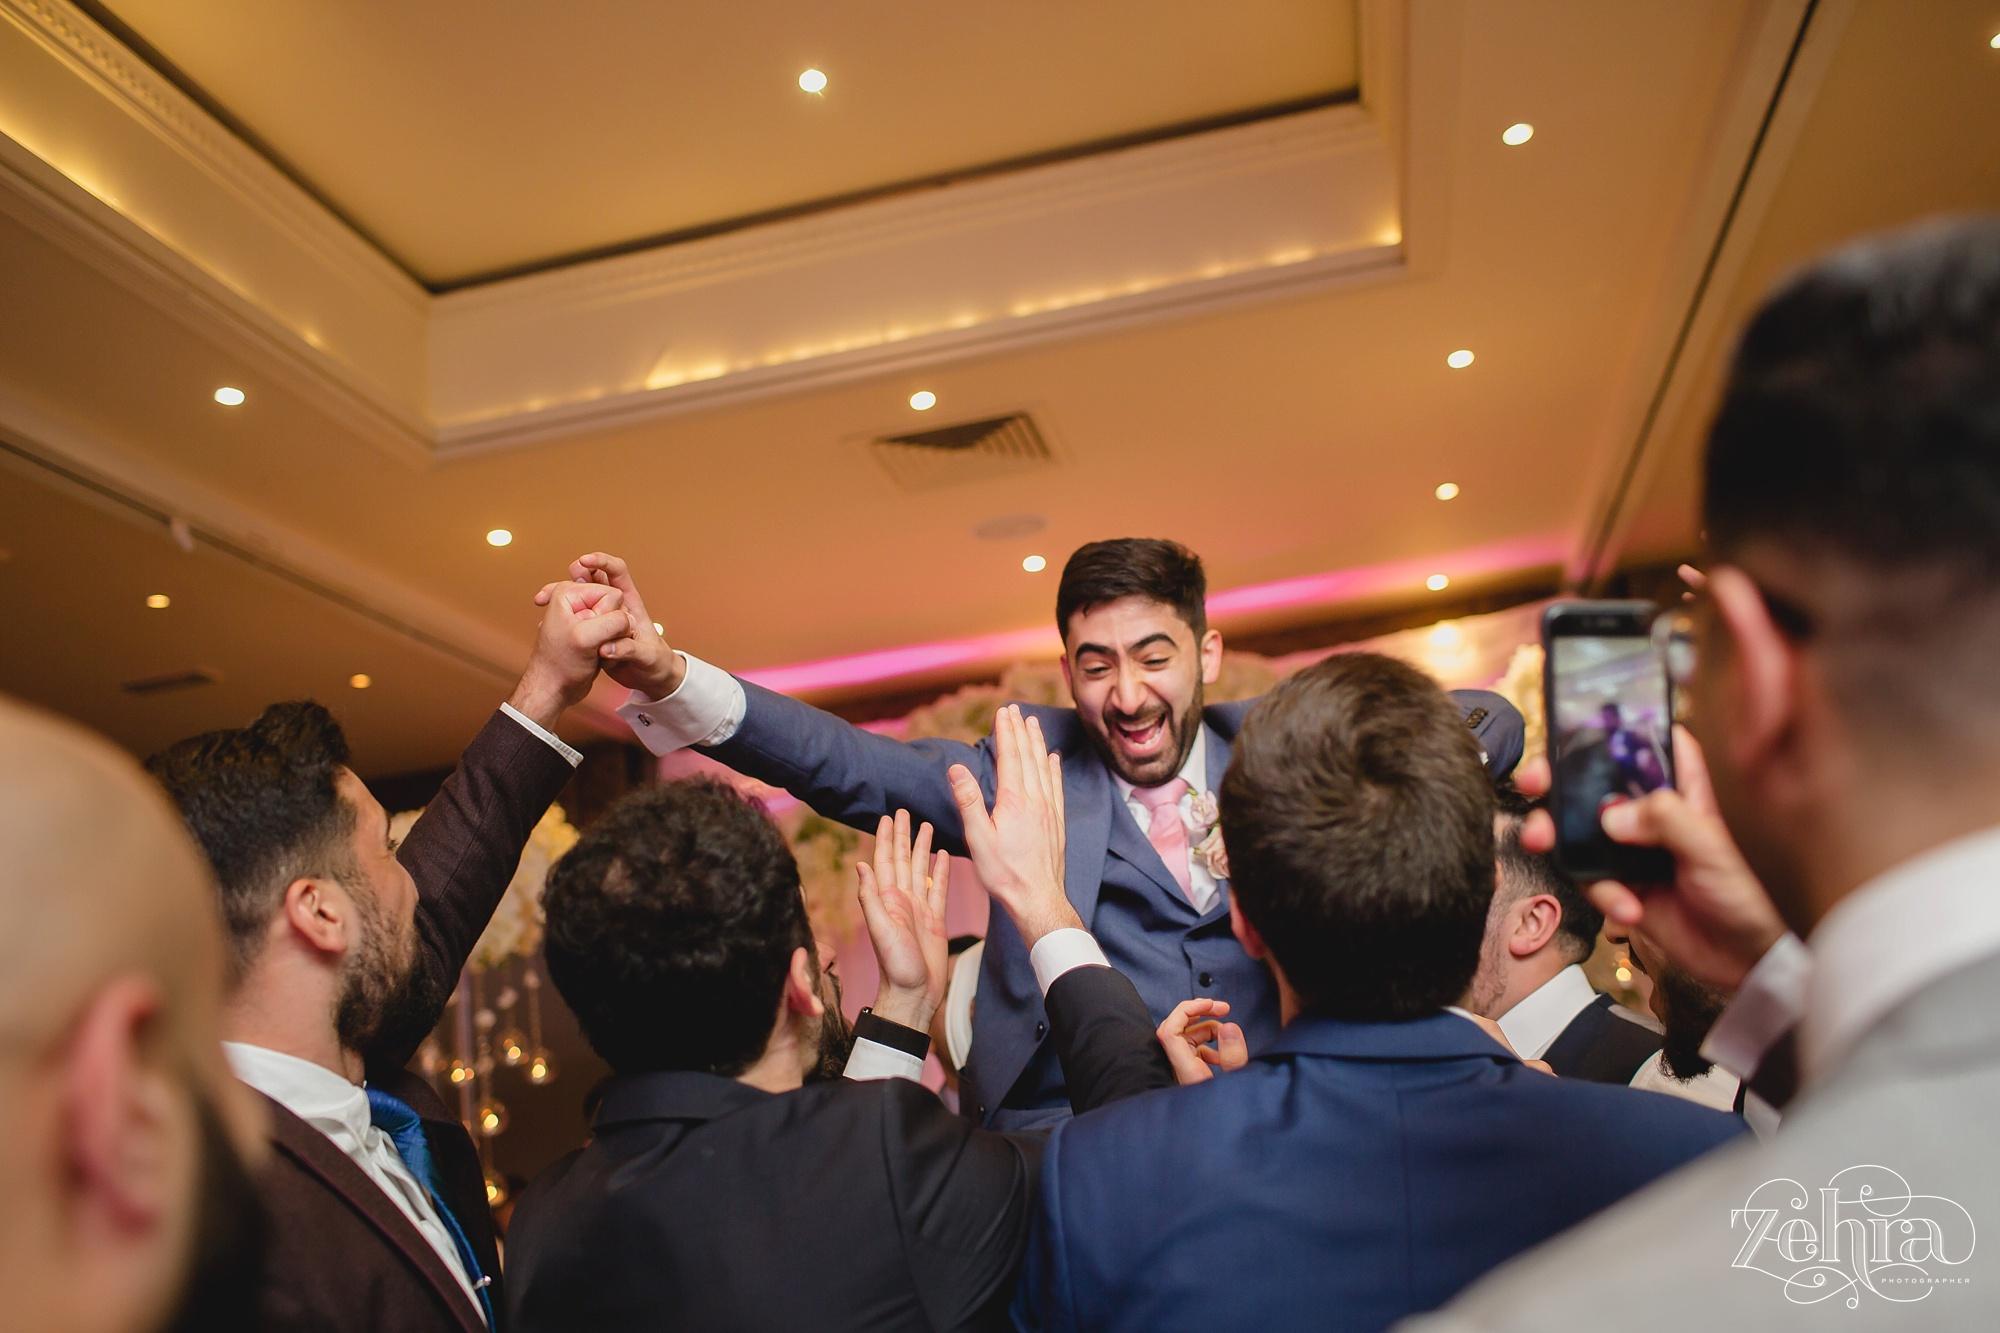 zehra photographer mere cheshire wedding_0042.jpg